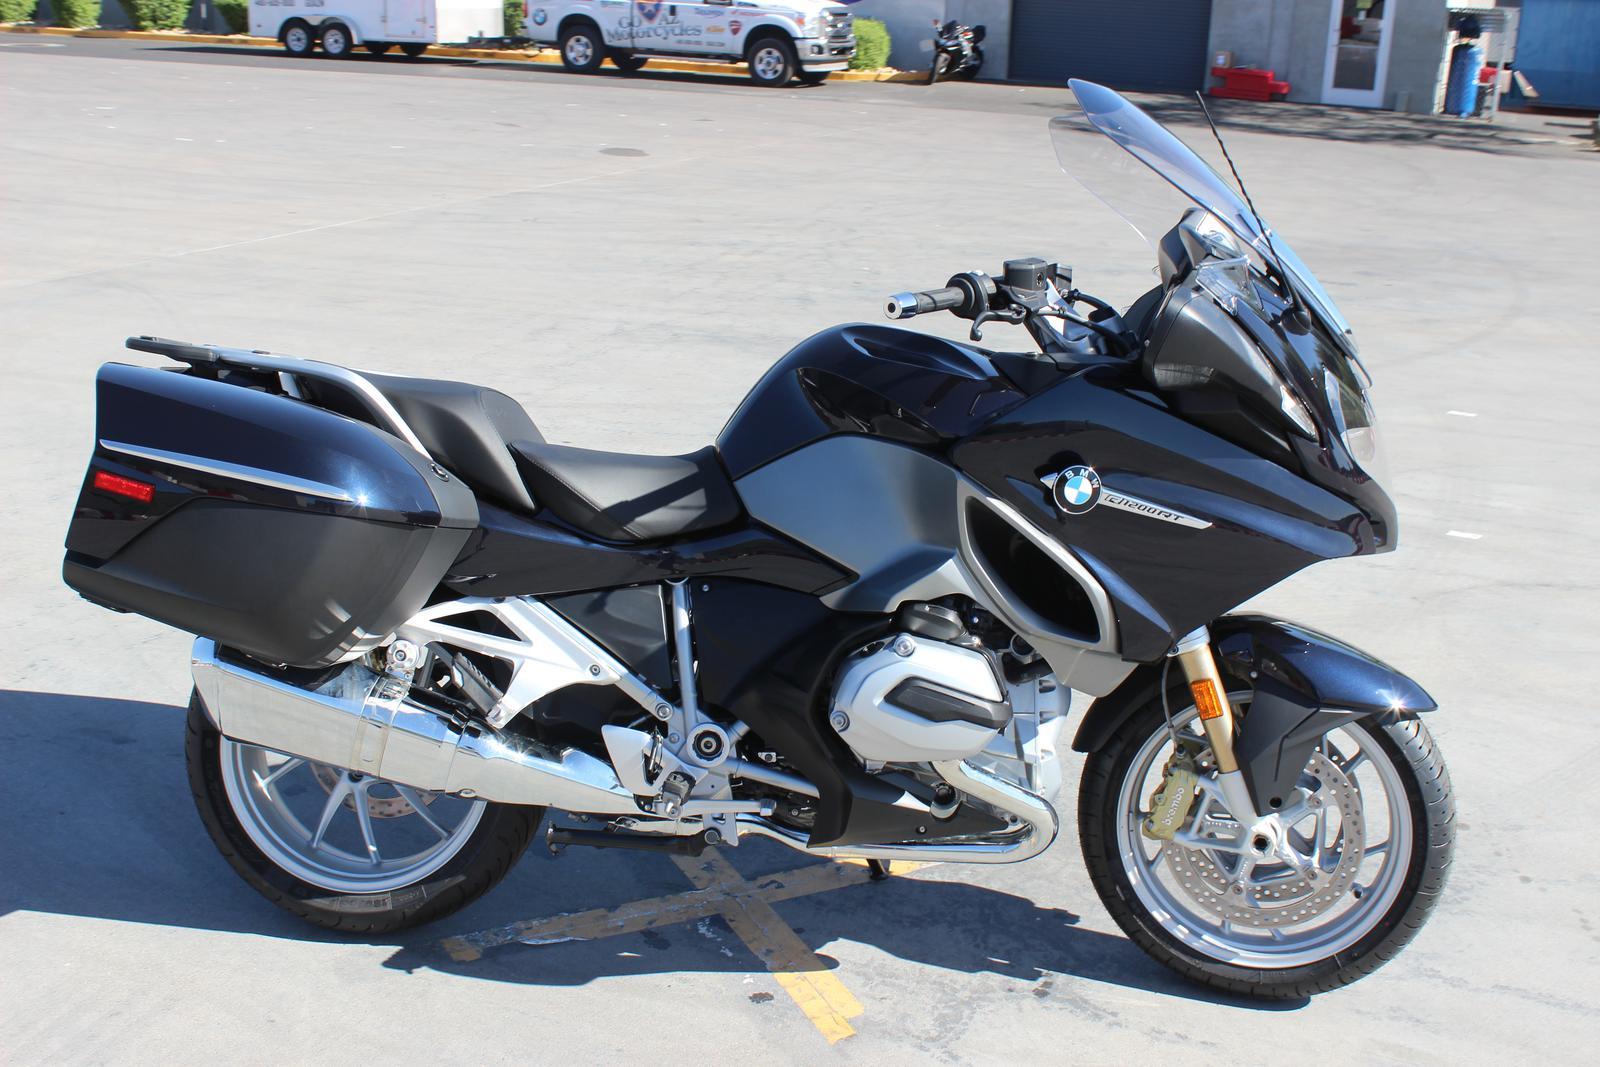 2018 Bmw R 1200 Rt For Sale In Scottsdale Az Go Az Motorcycles In